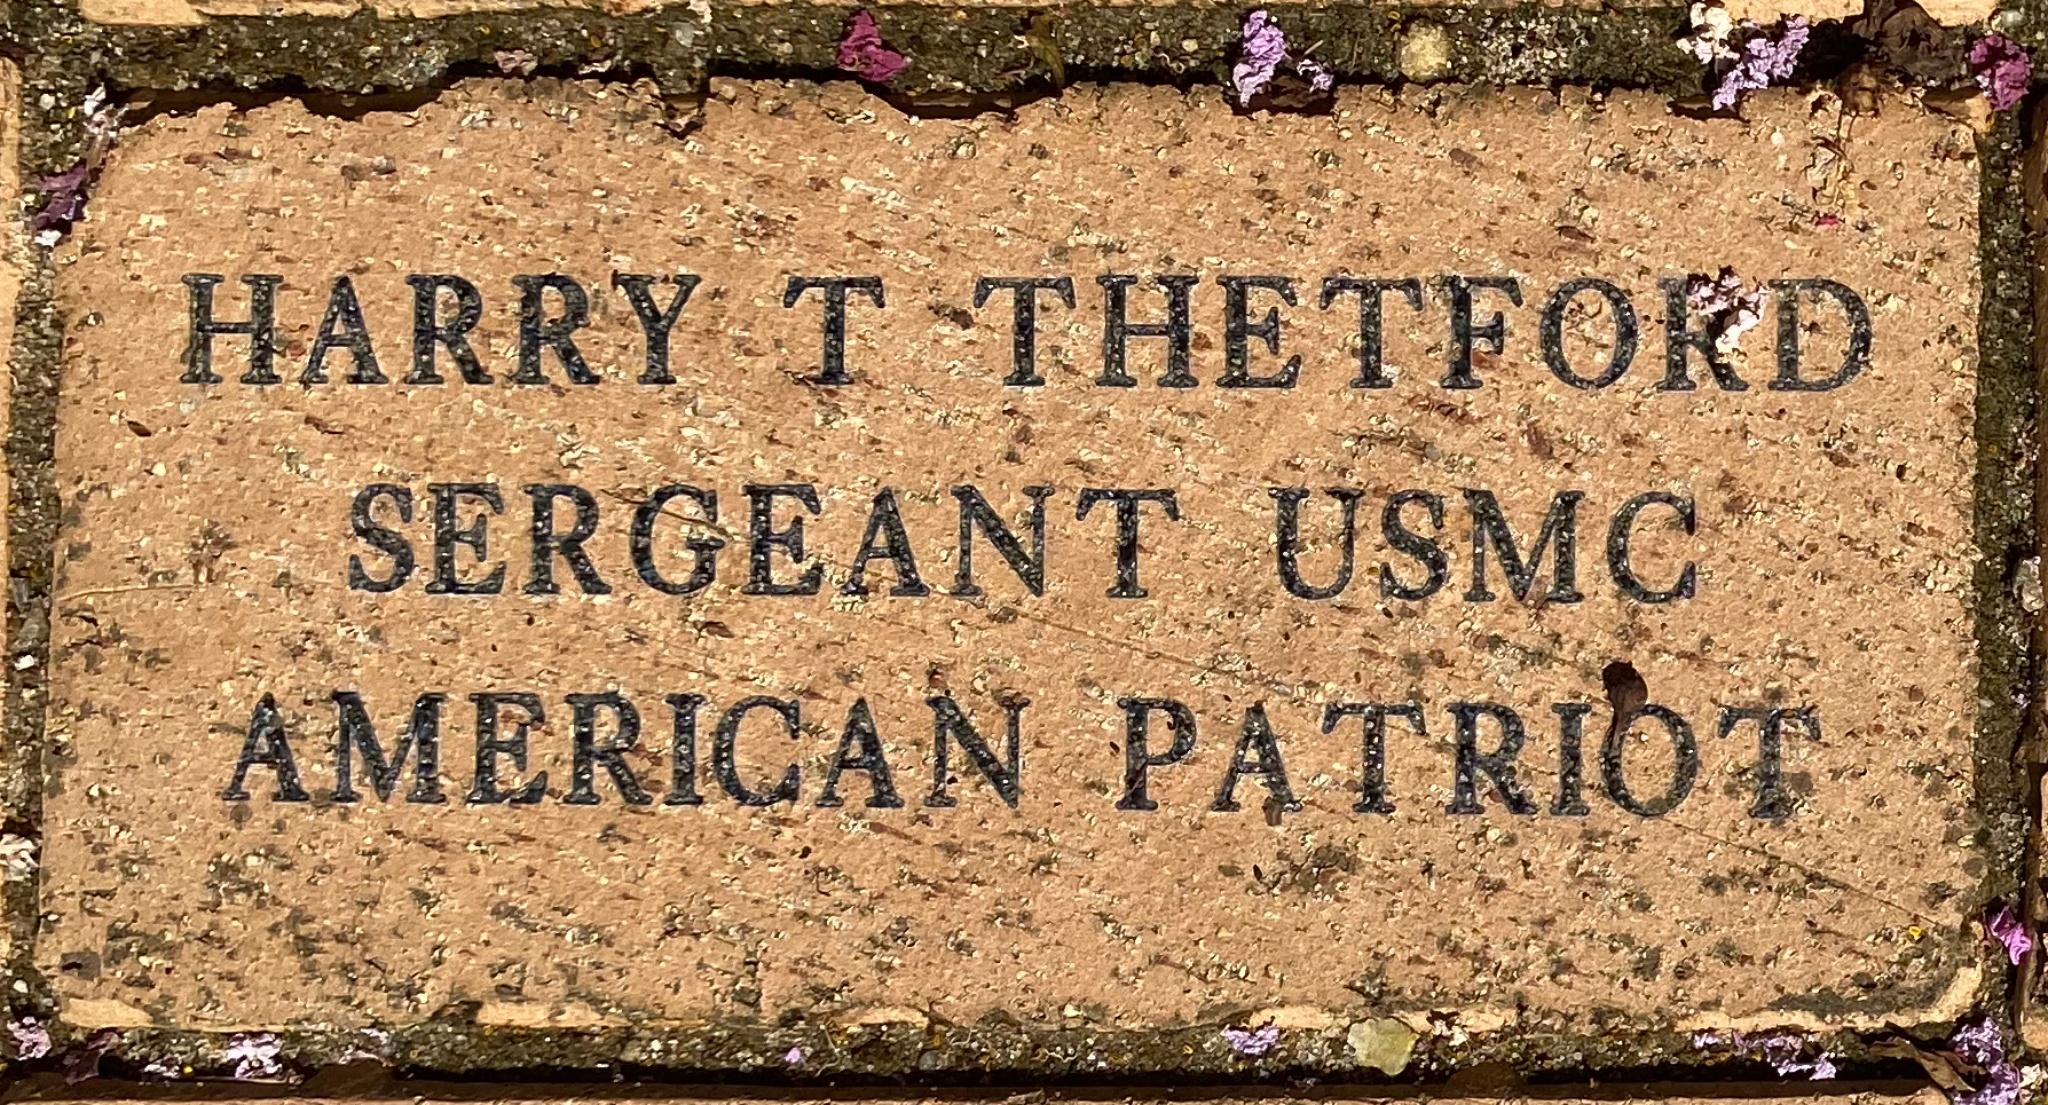 HARRY T THETFORD SERGEANT USMC AMERICAN PATRIOT